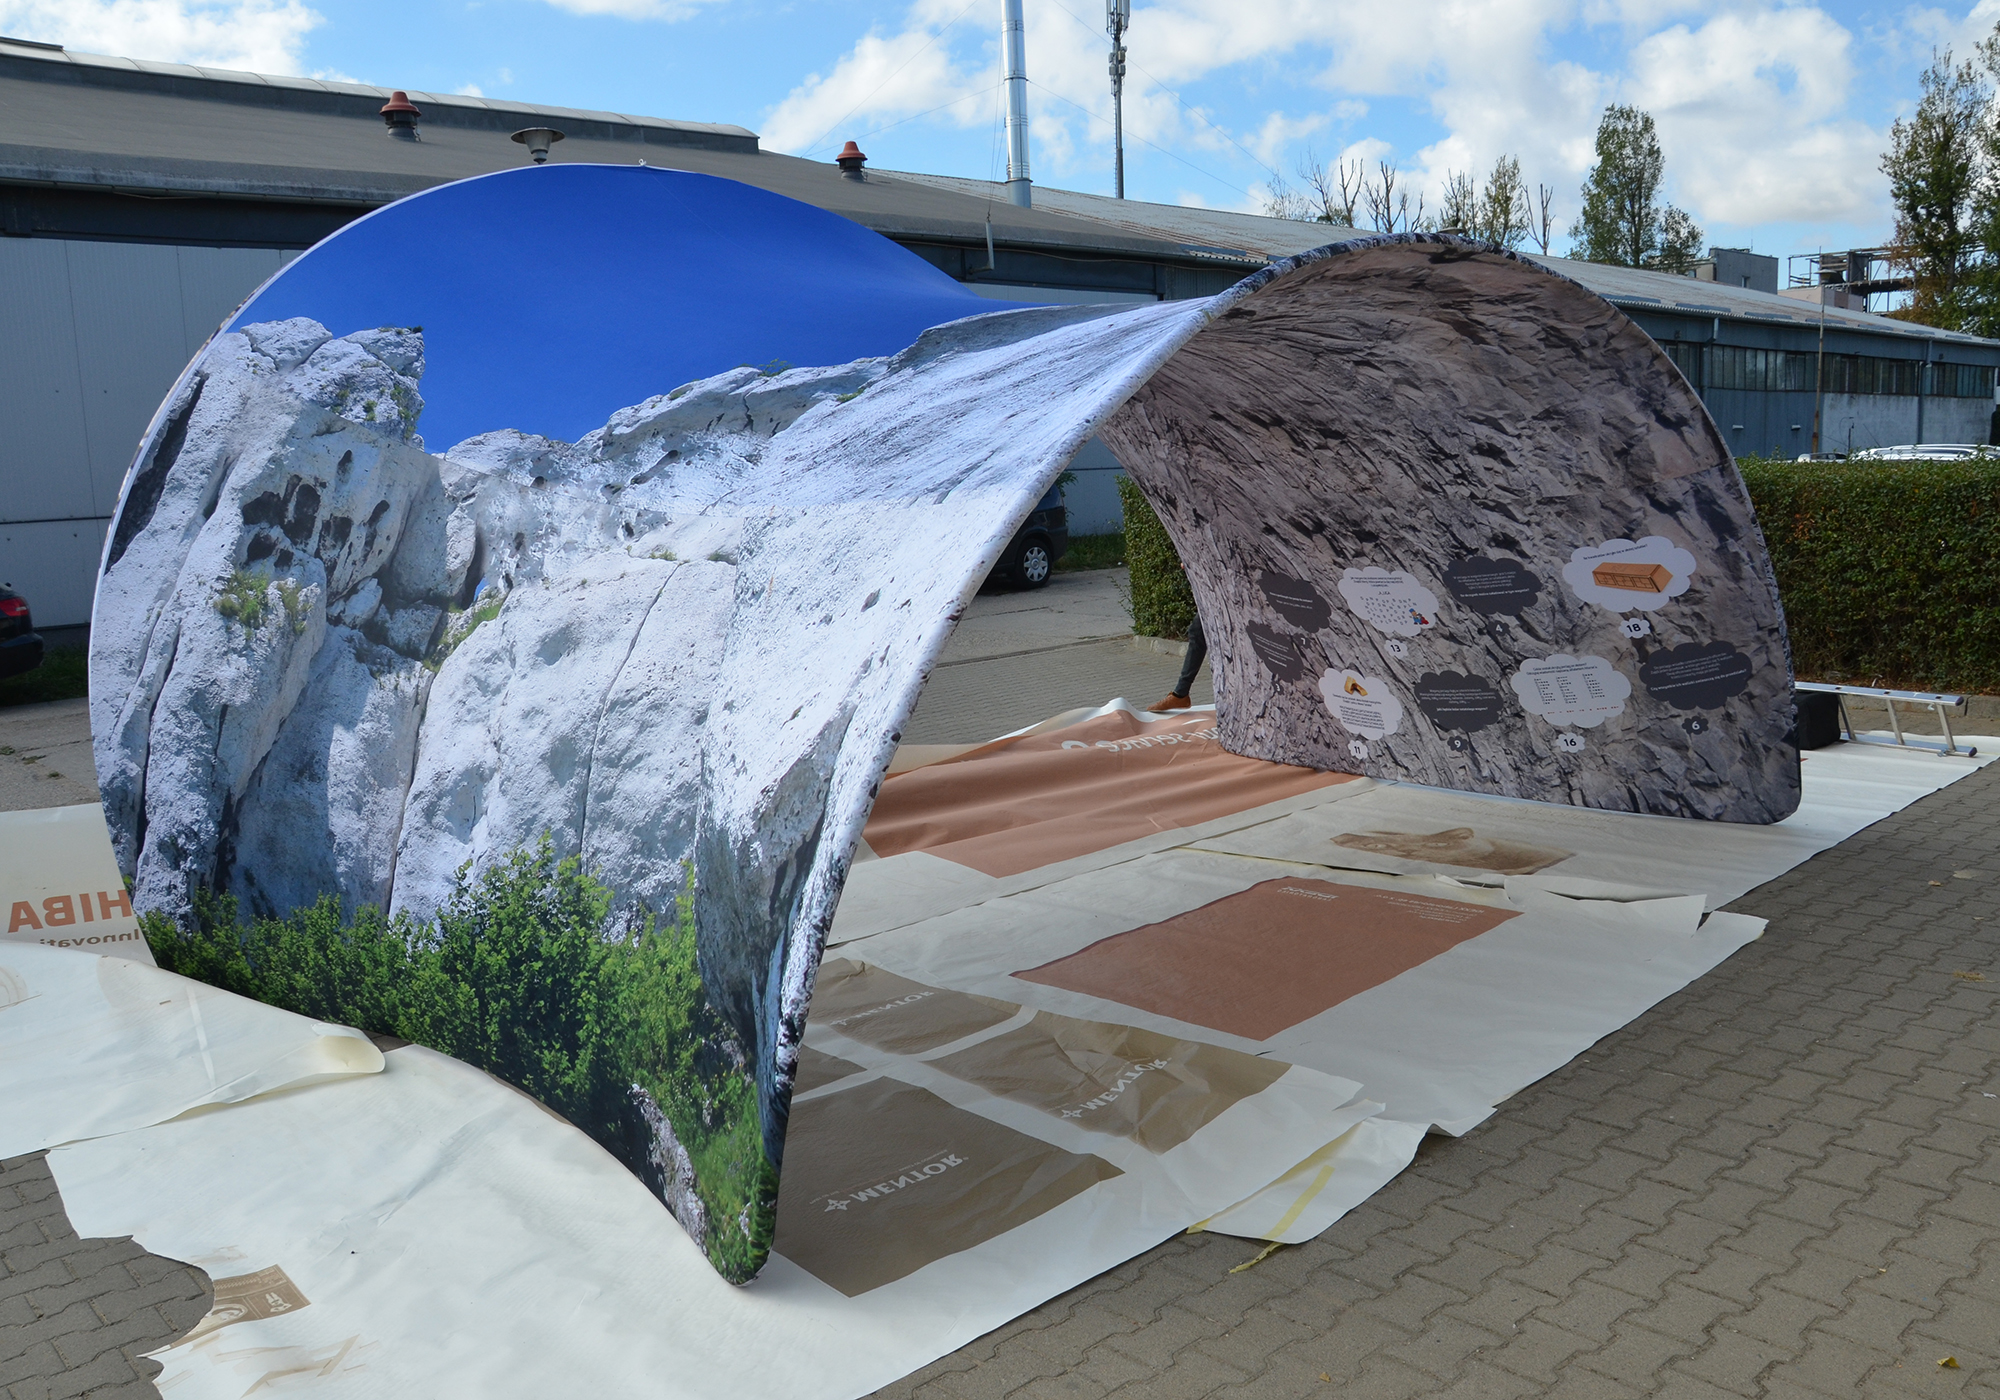 Arche TxW Shelter 550 cm Objets publicitaires  personnalisation  FRANCE SUD PIERRE BE DISPLAY goodies personnalisation marseille